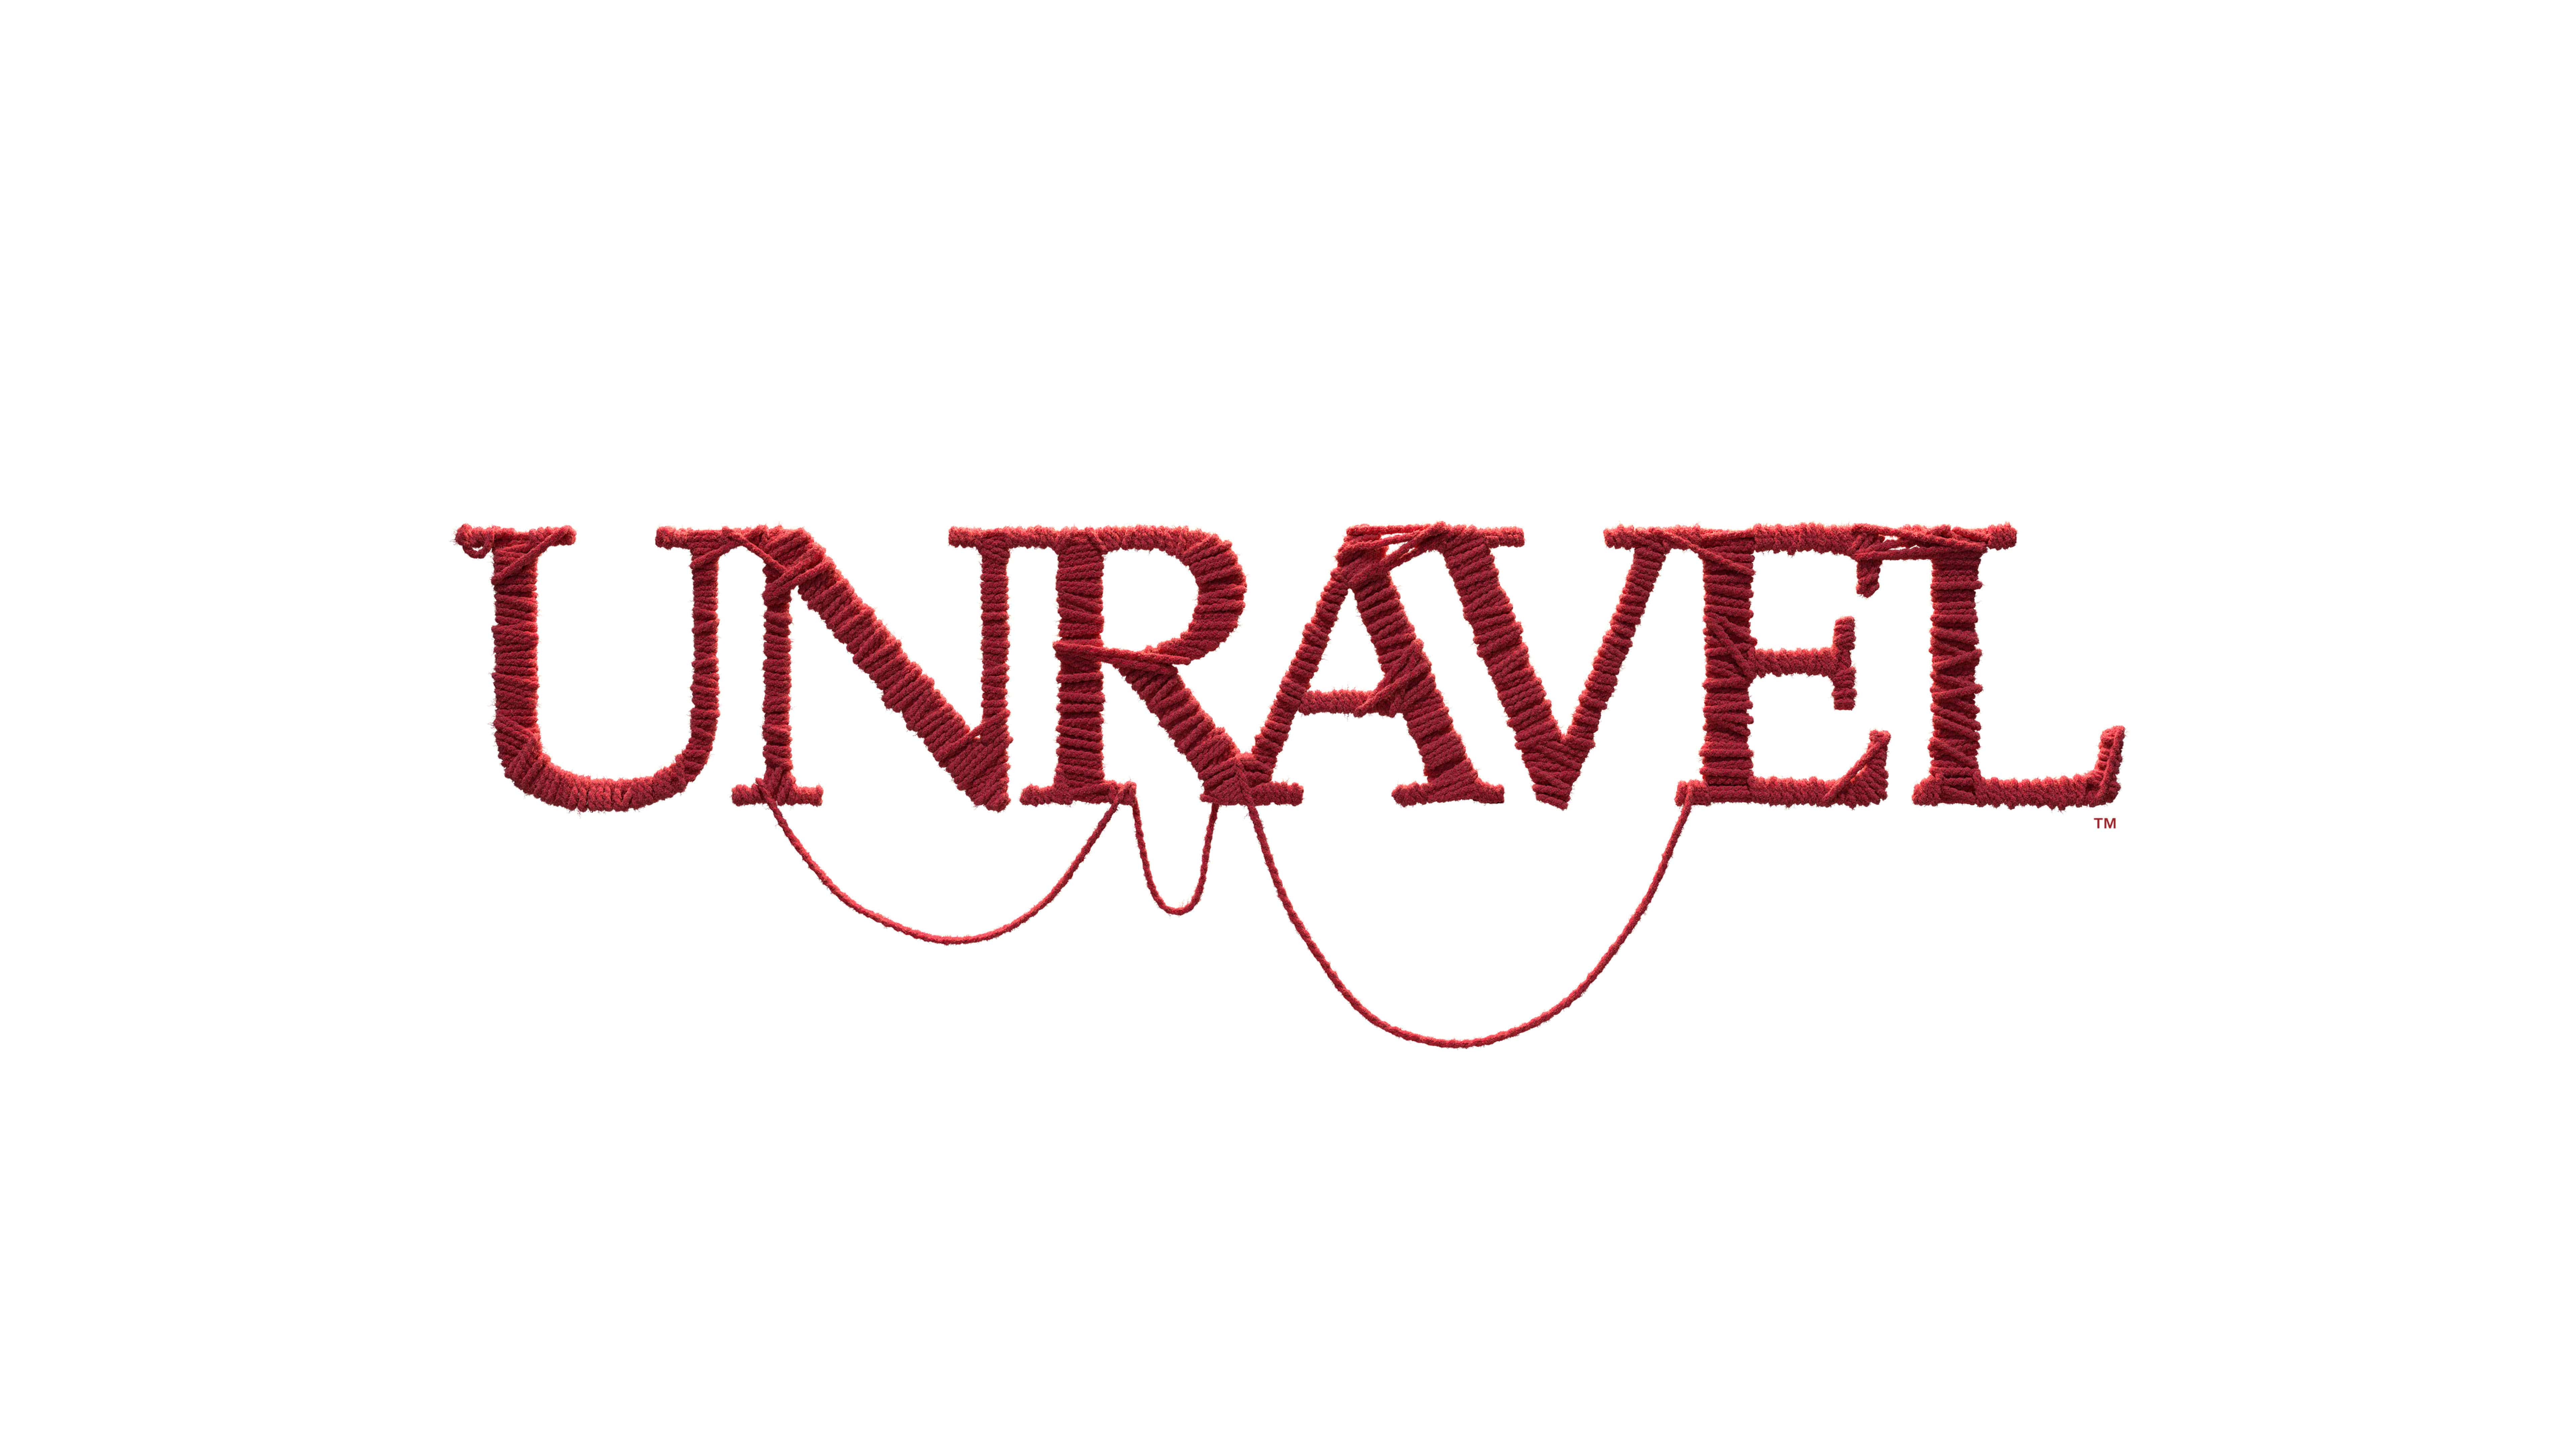 unravel logo uhd 8k wallpaper